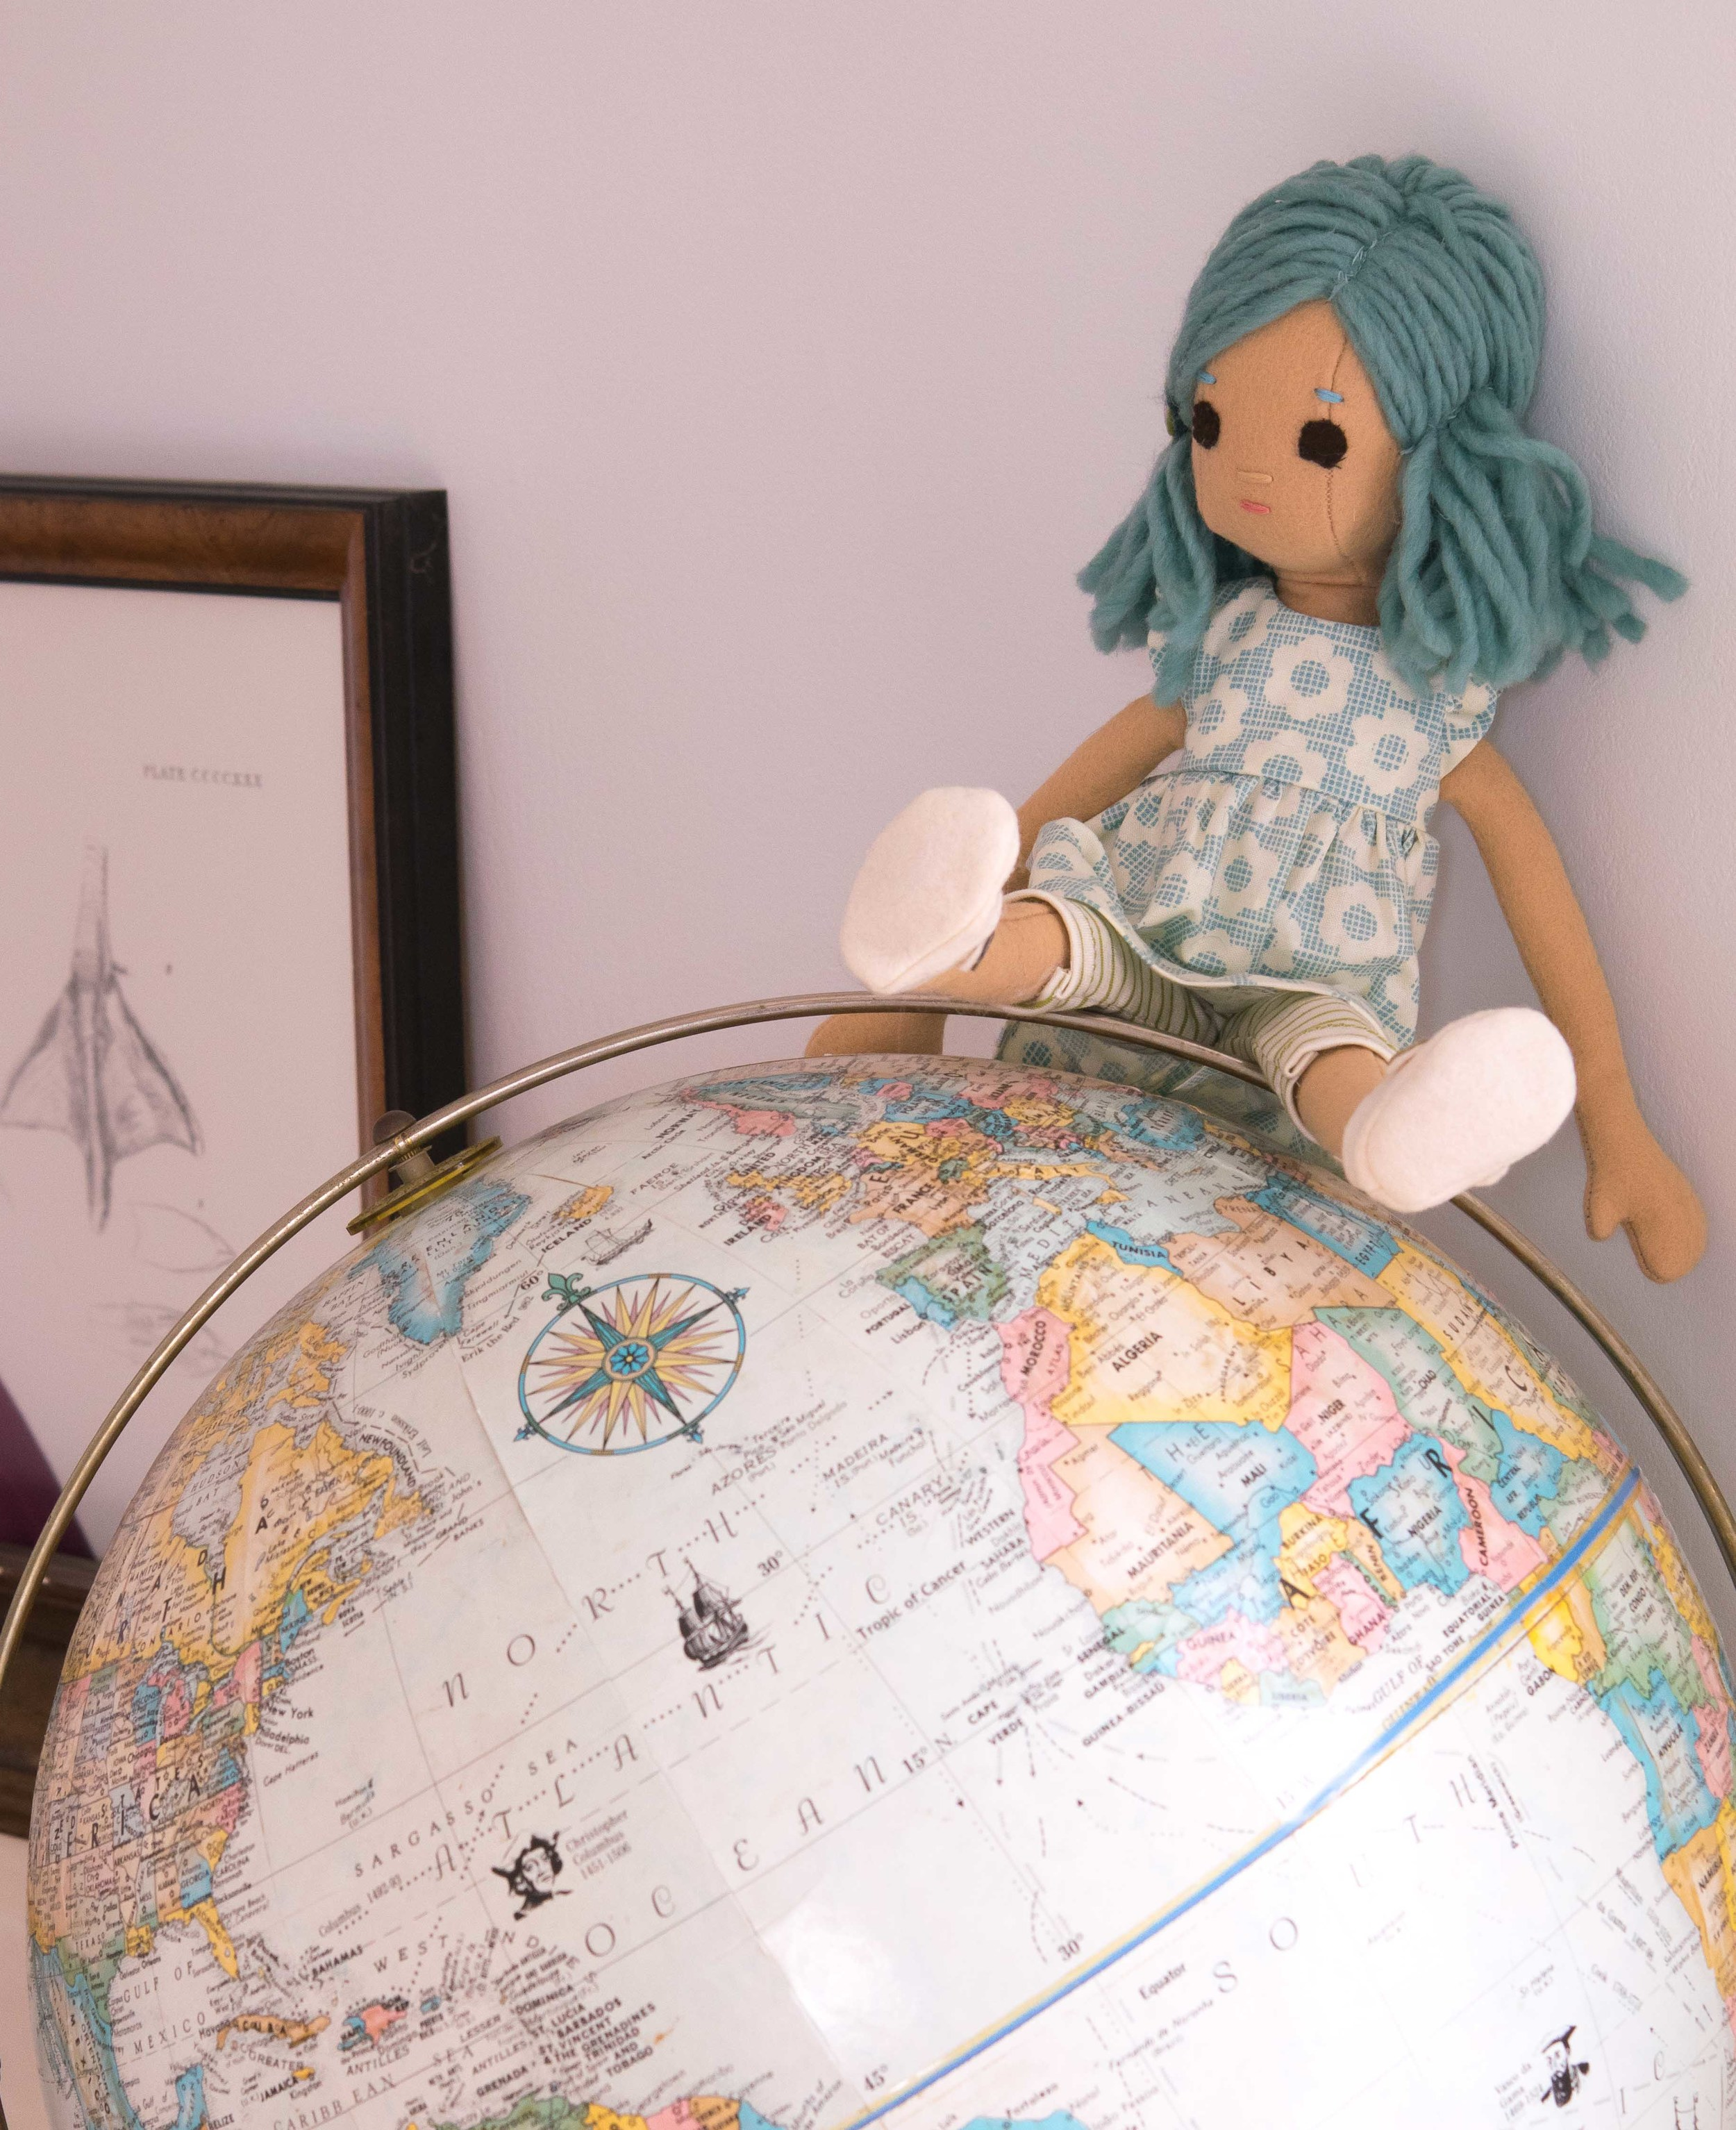 extrasmall Phoebe world-1.jpg